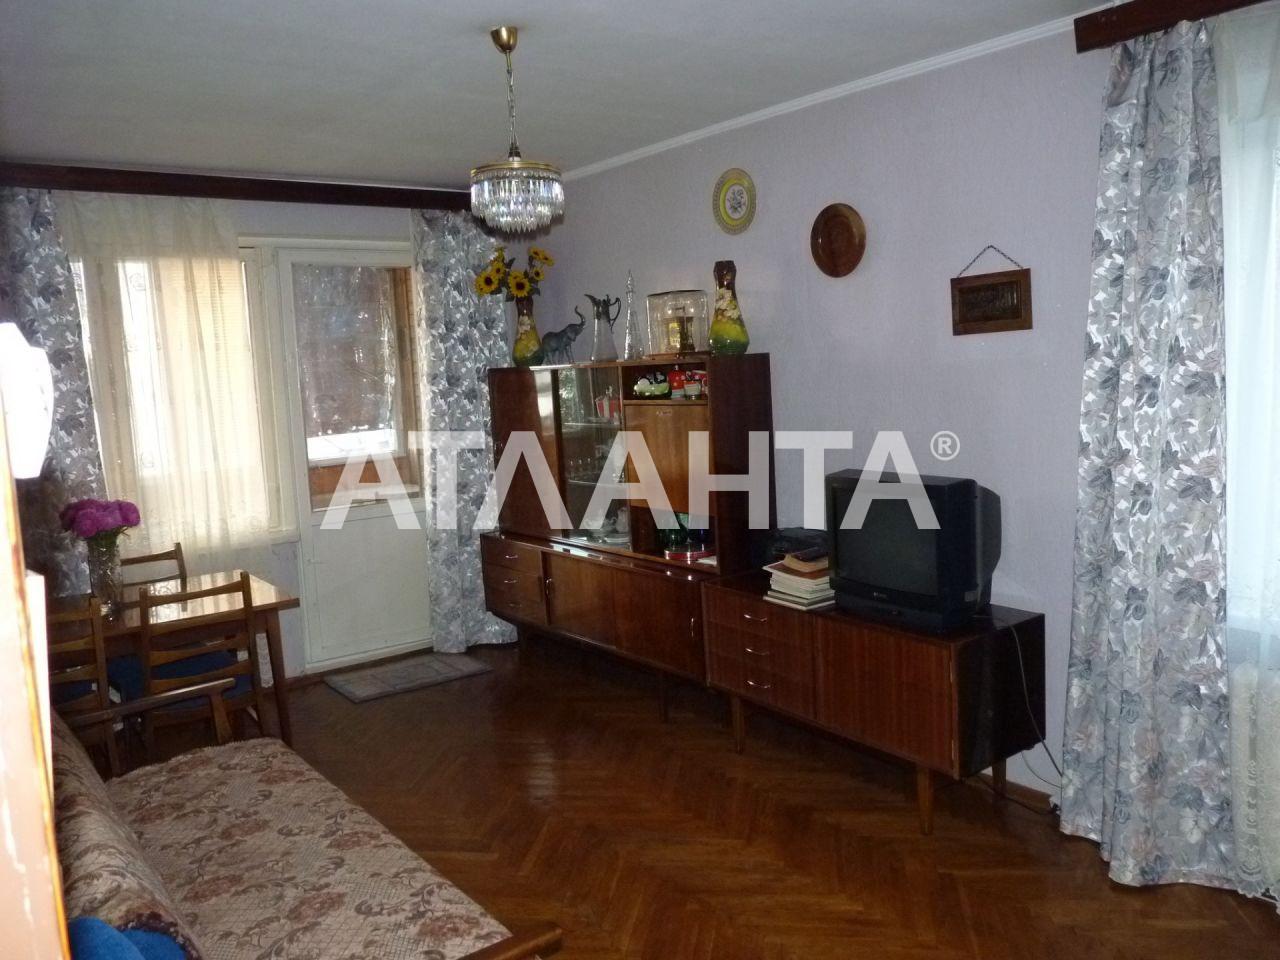 Продается 4-комнатная Квартира на ул. Днепровская Наб. — 65 000 у.е. (фото №7)